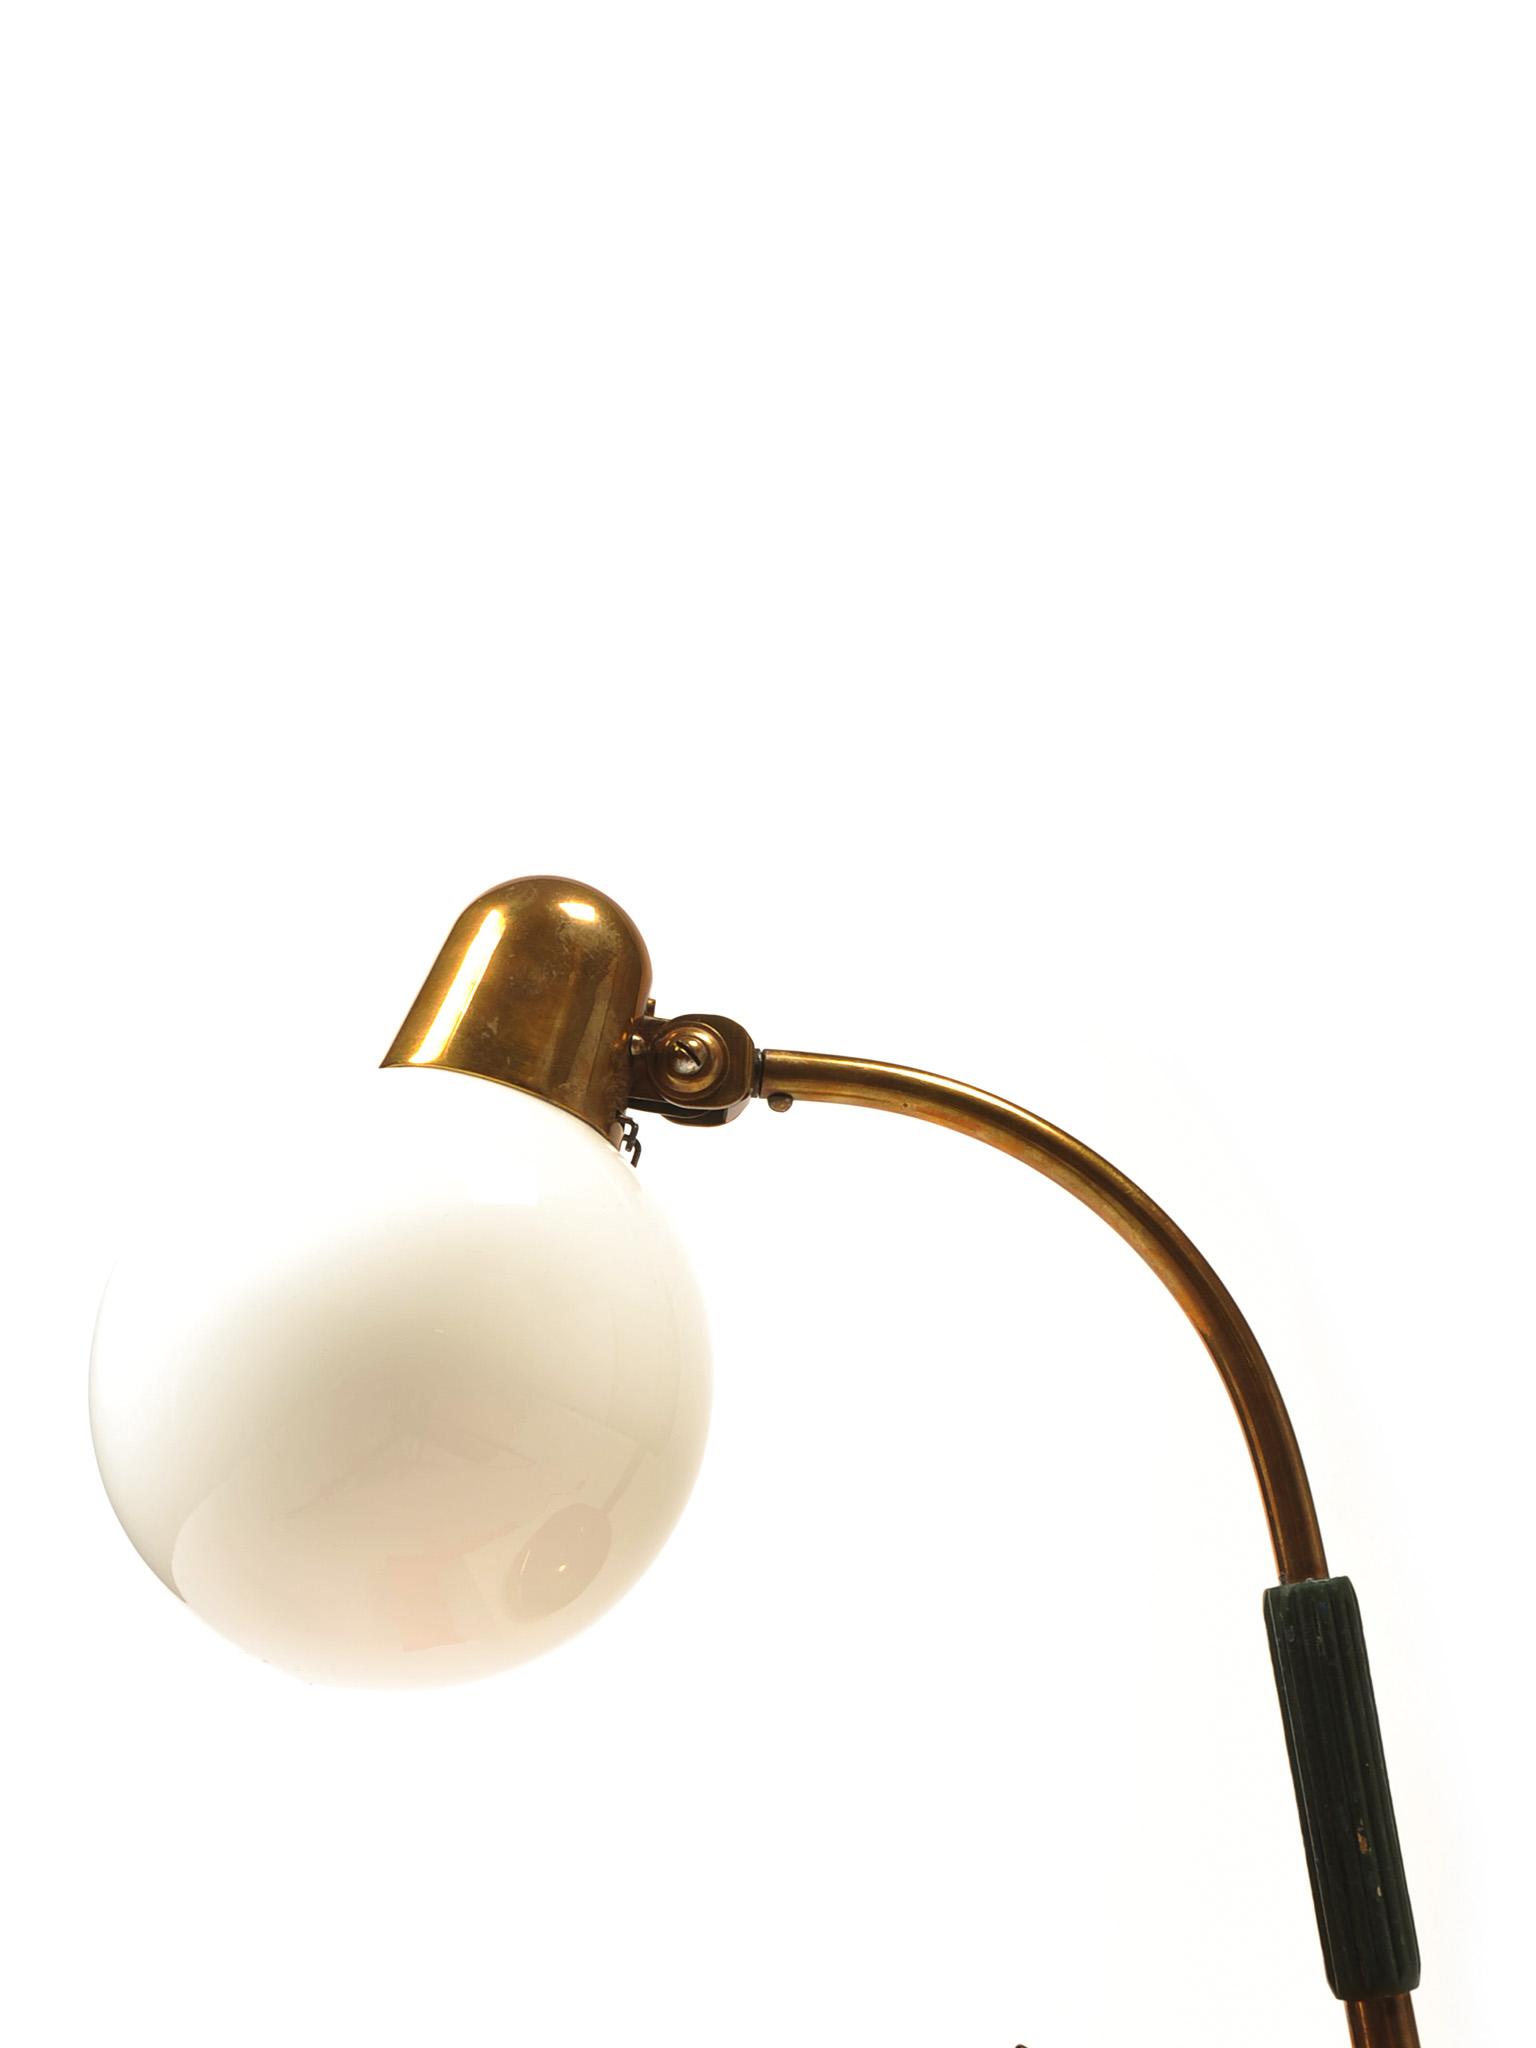 ANONYMOUS DESK LAMP